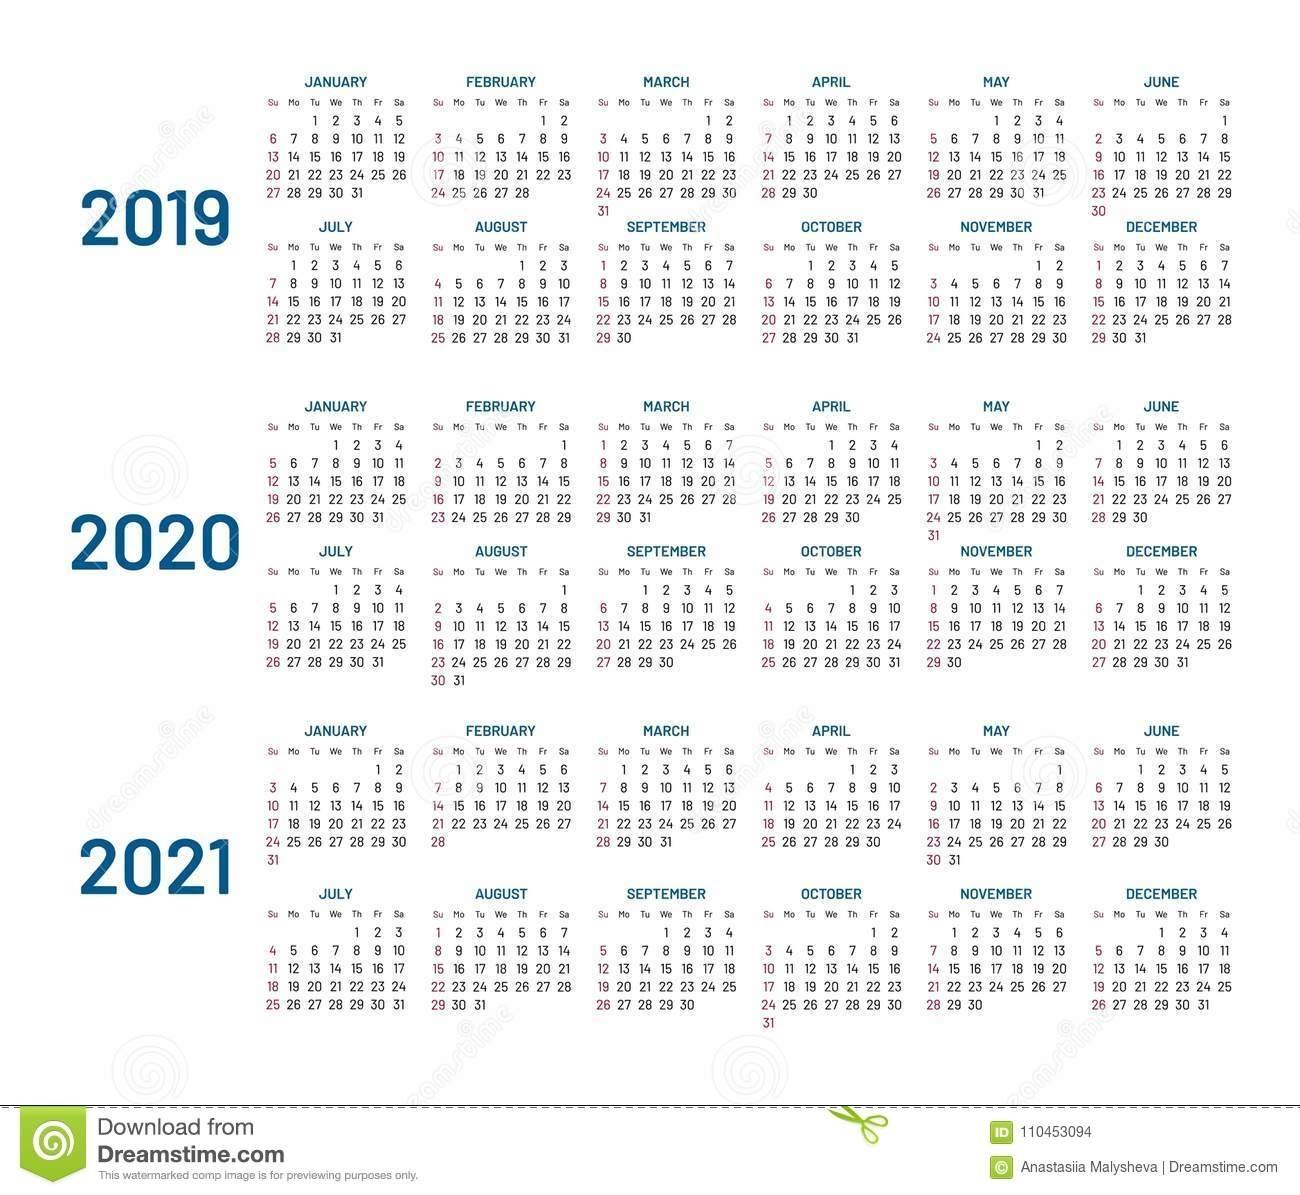 Three Years Calendar, 2019, 2020, 2021, Isolated, Flat Stock Vector inside Three Year Calendar 2019 2020 2021